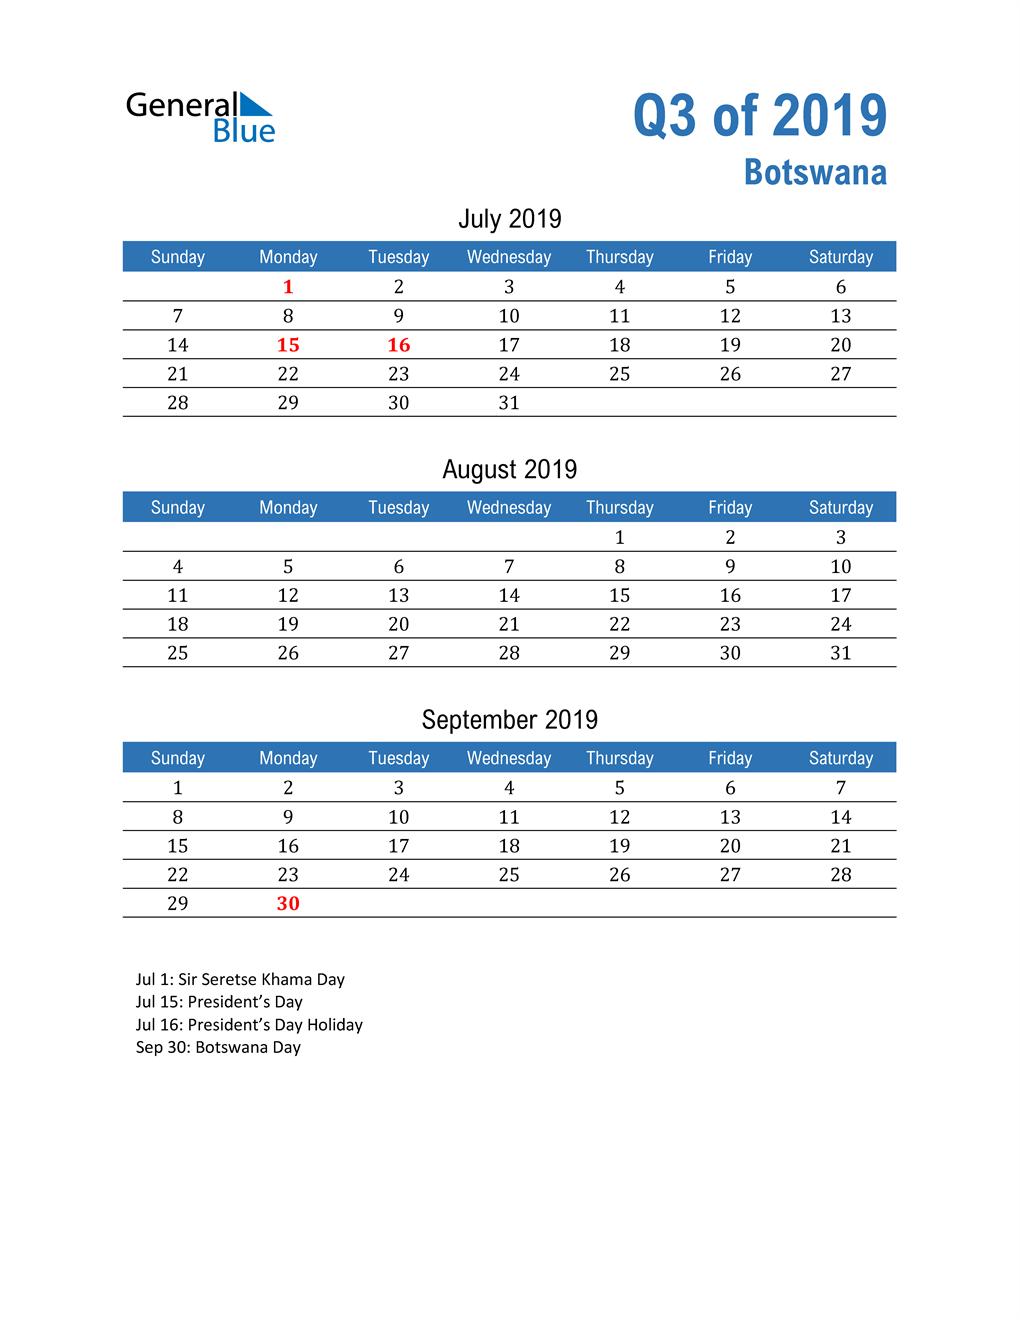 Botswana 2019 Quarterly Calendar